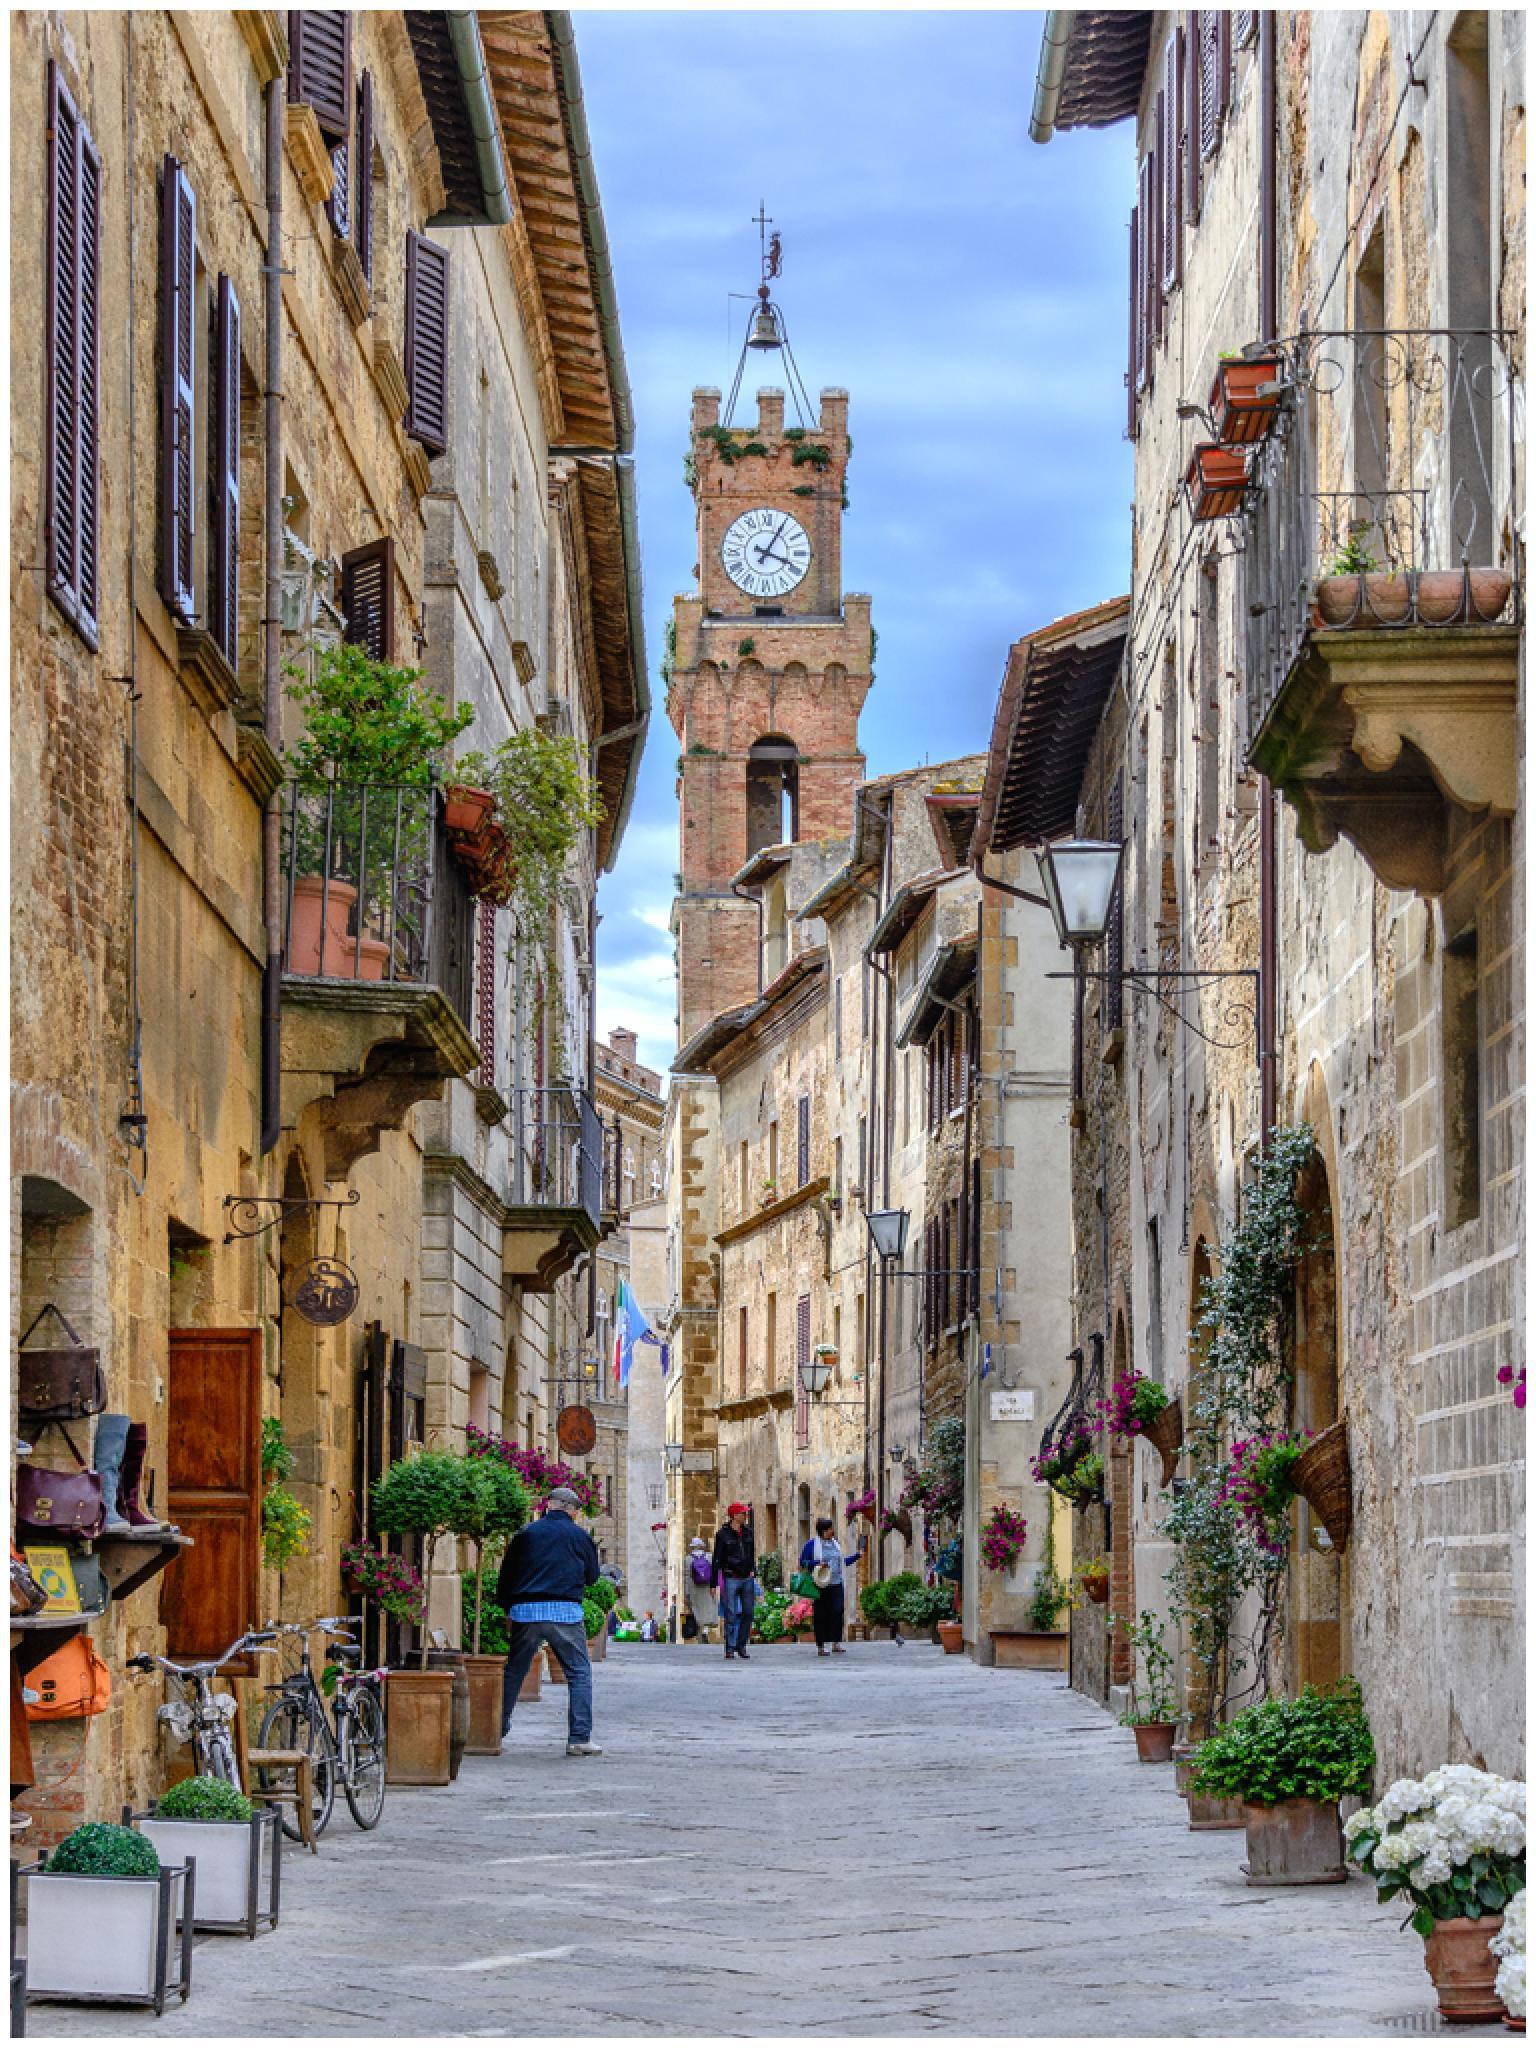 Main Street by Giancarlo Bisone